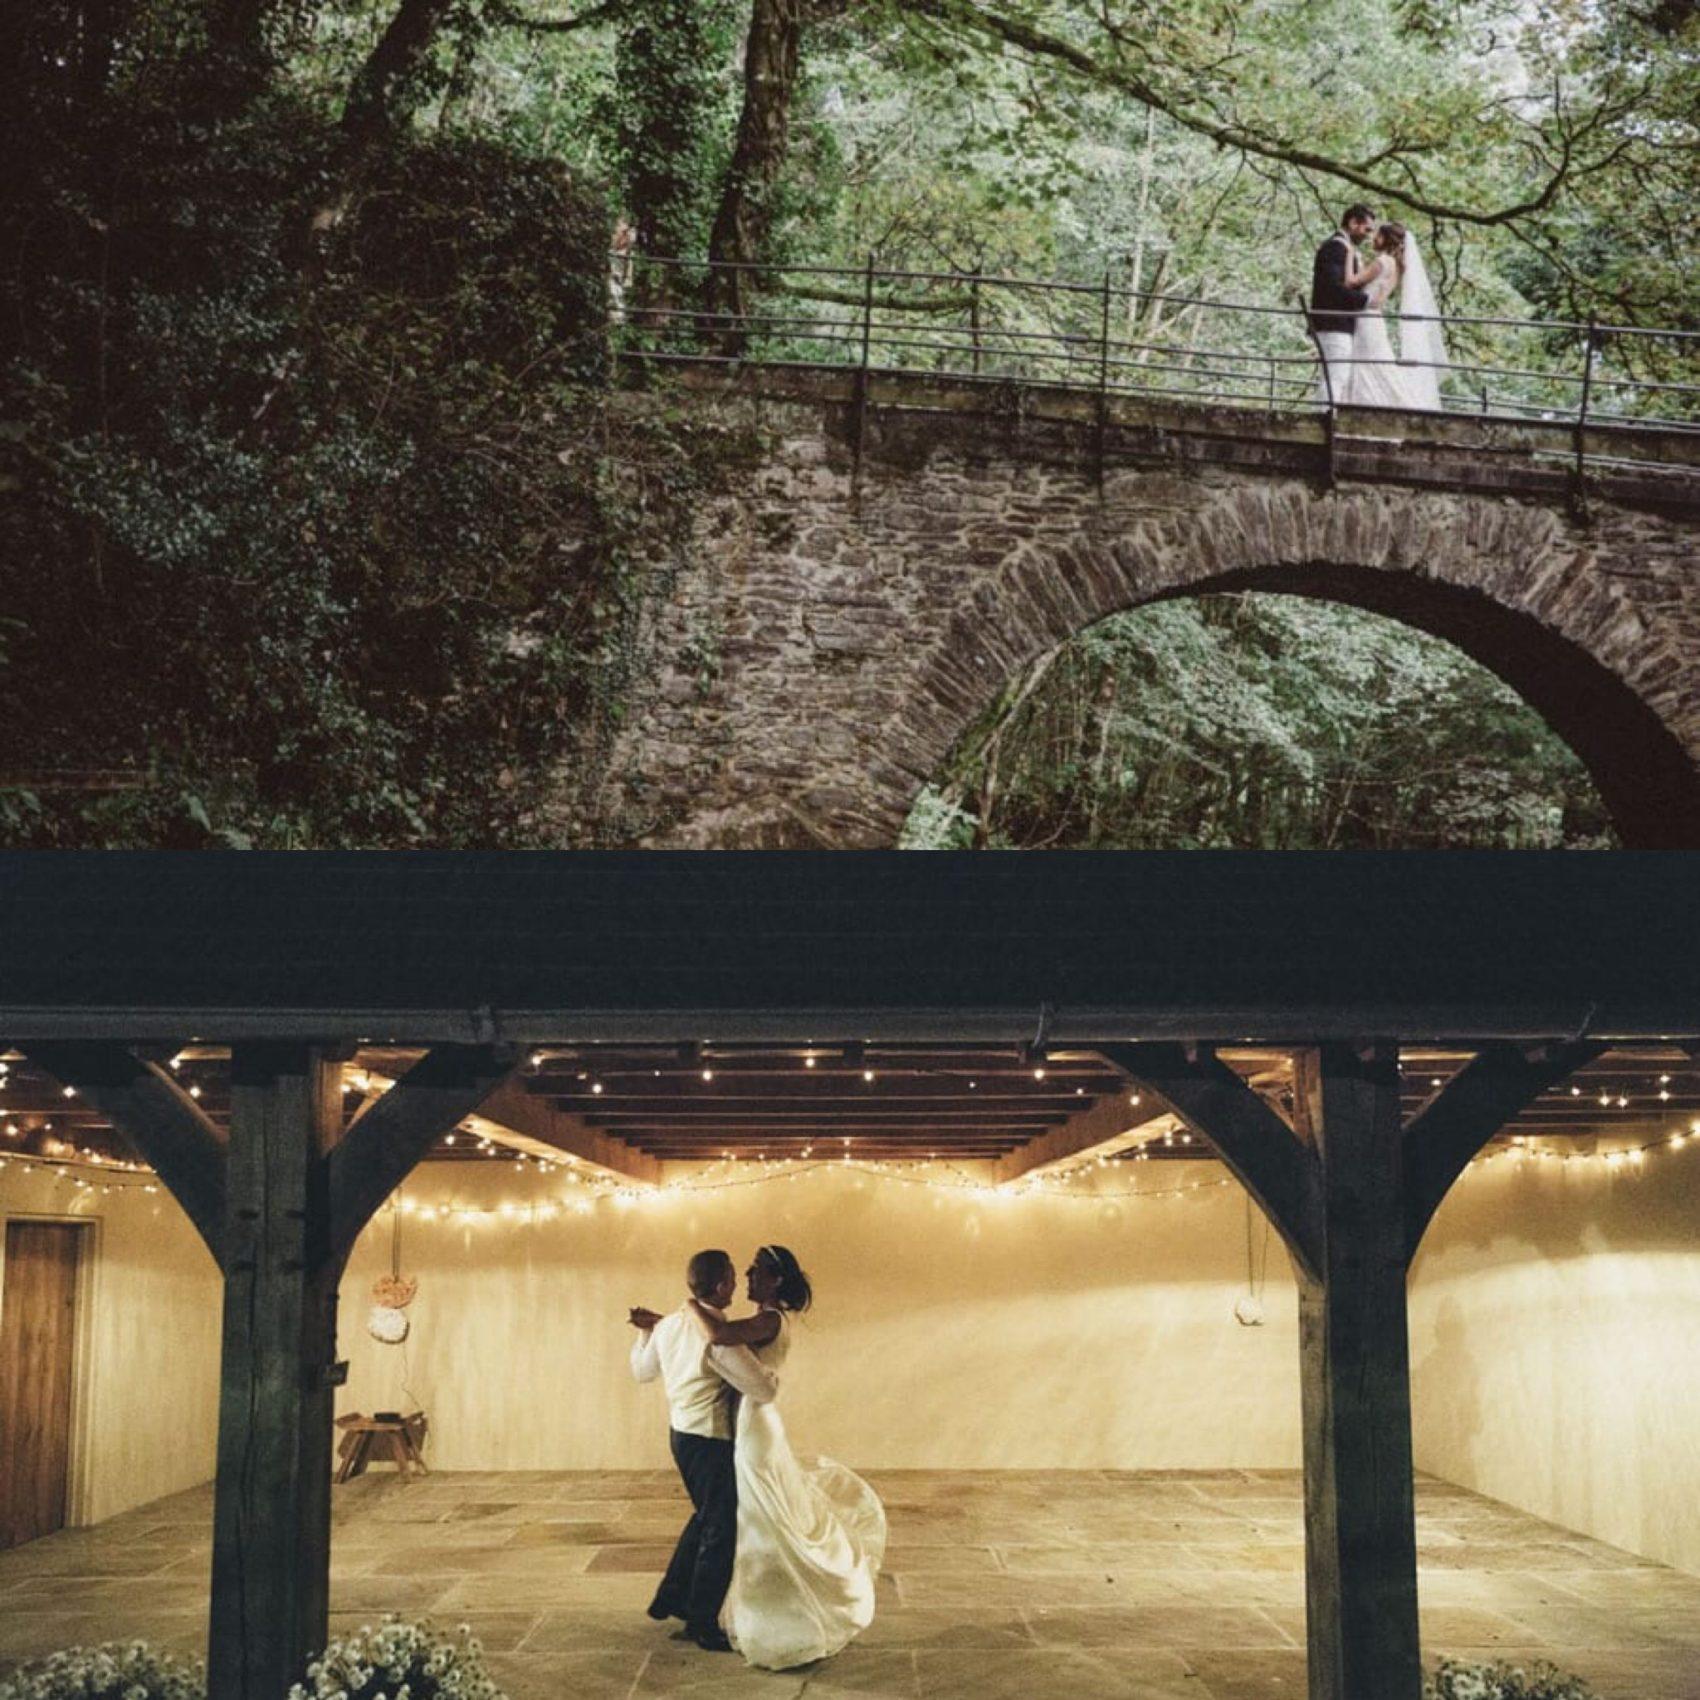 bride & groom, ever after, dancing, bridge, barn, lower grenofen, woodland, greenery, trees, fairy lights, love, happiness, river